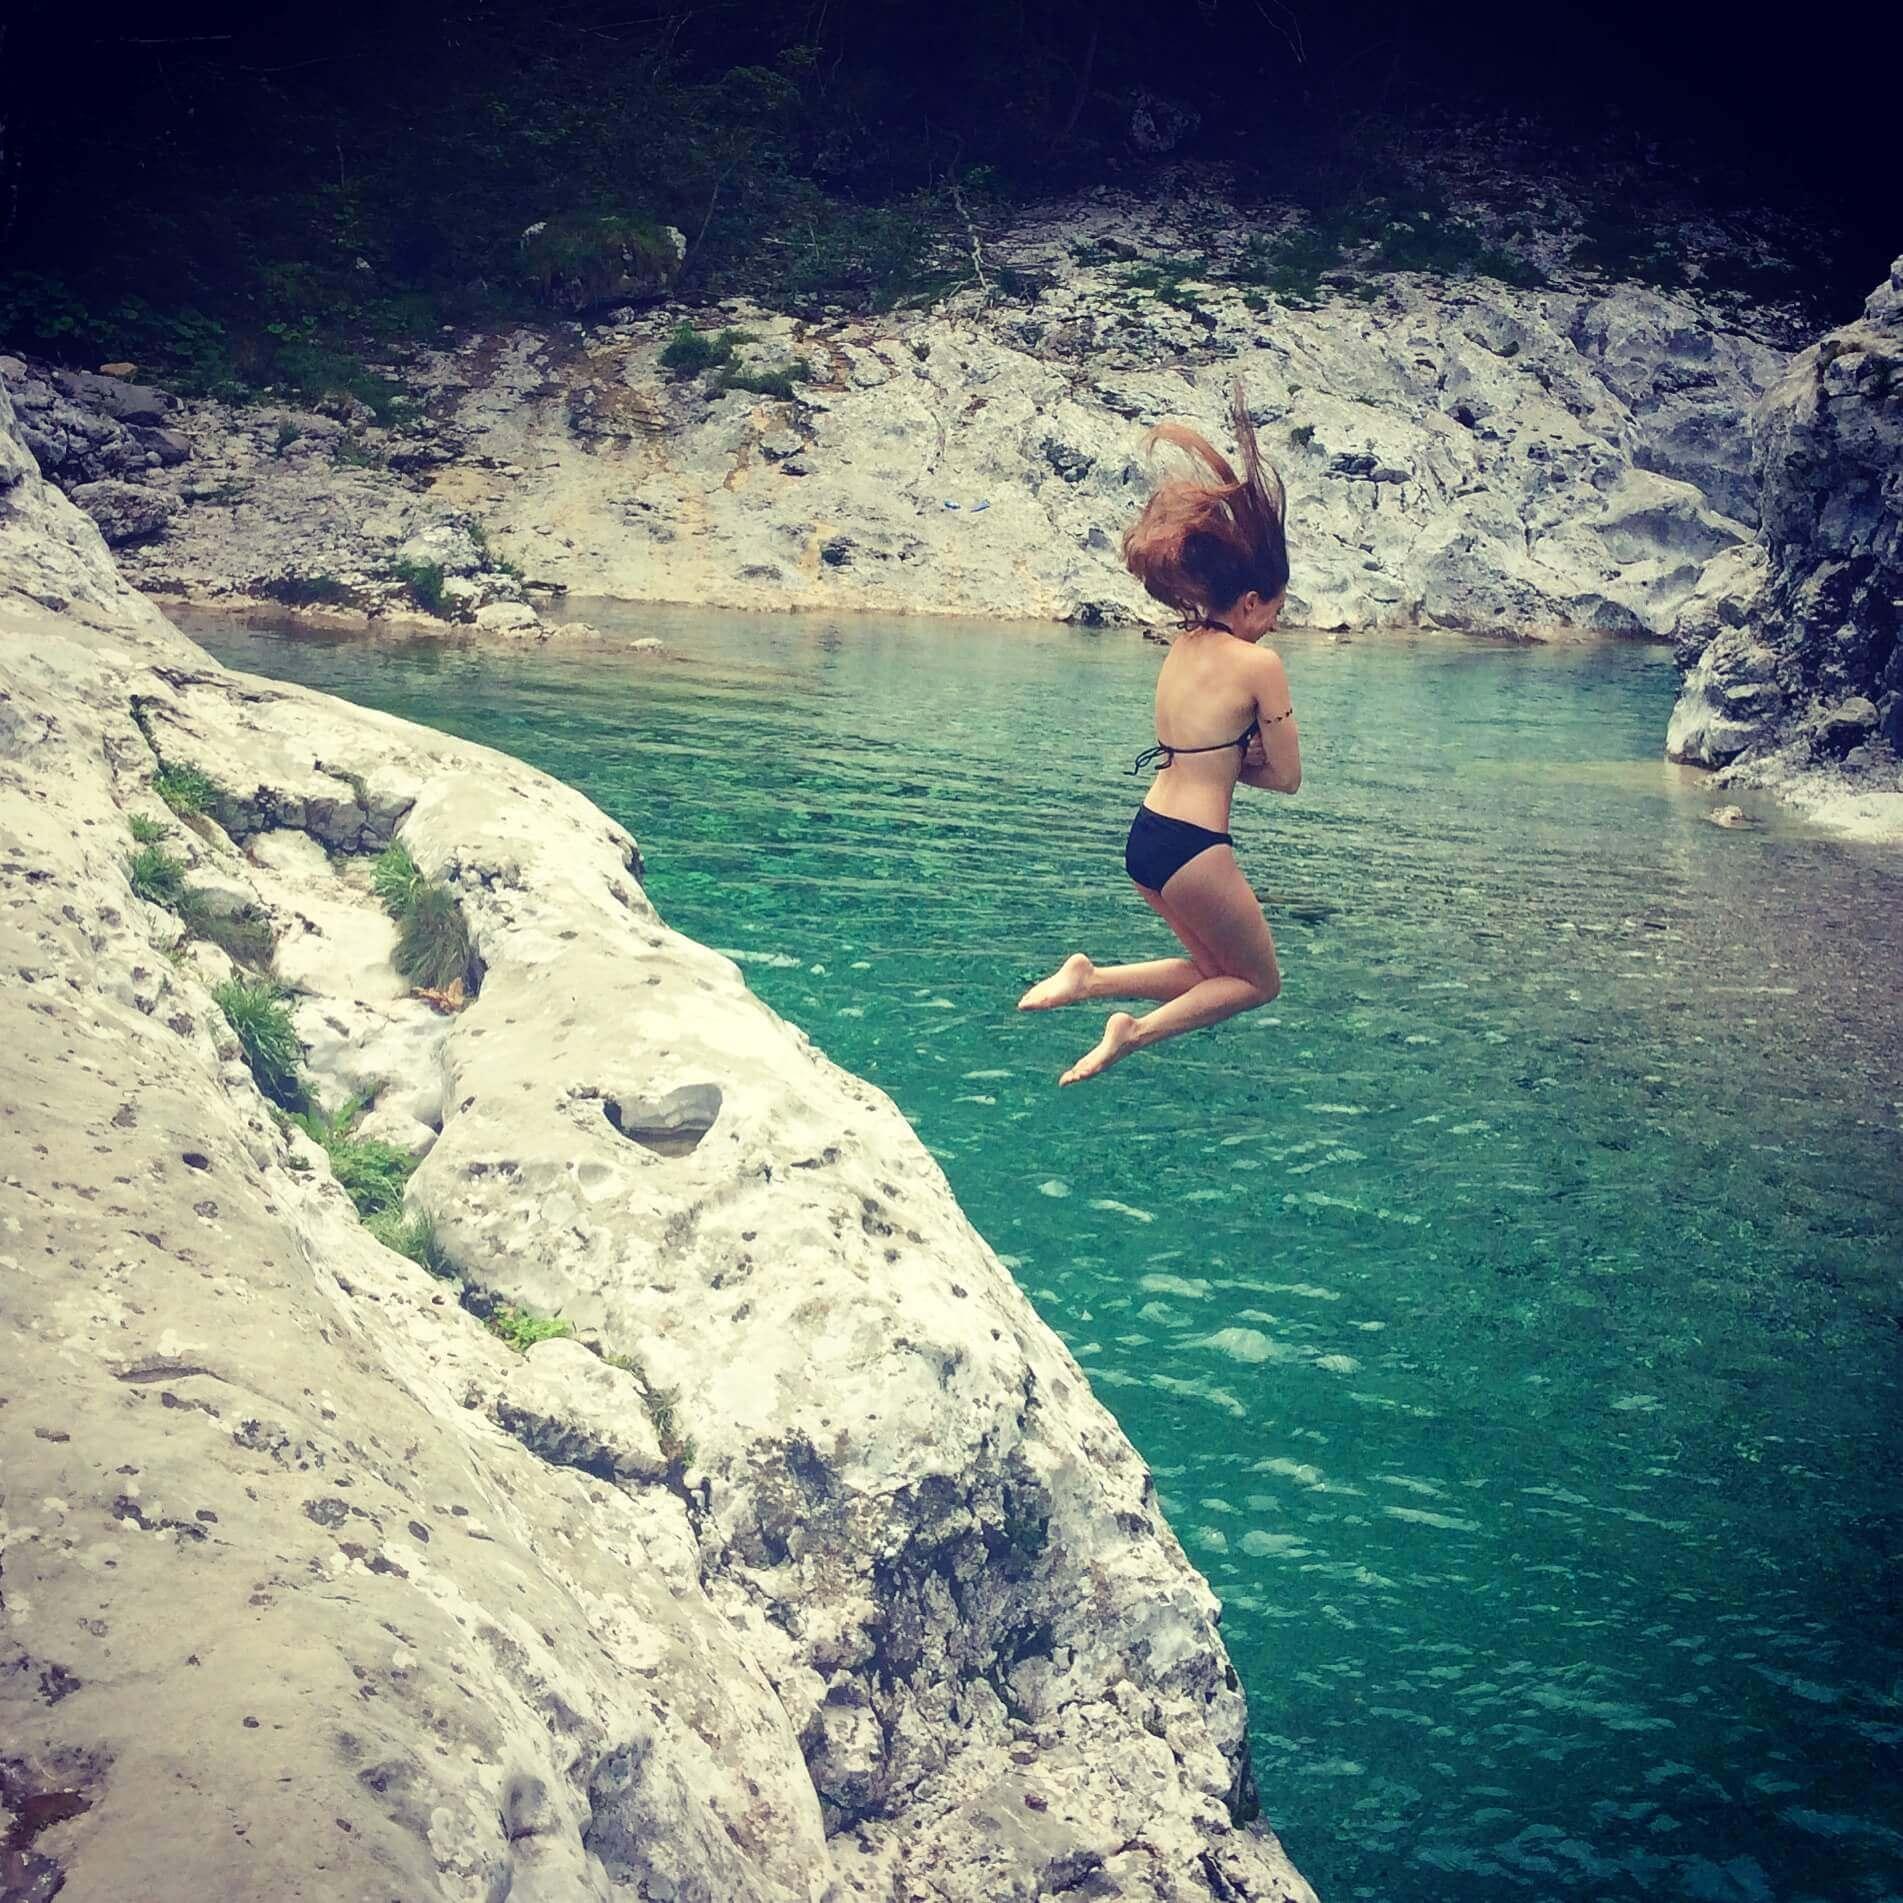 Friulian Dolomites From Italian Wine To Wild Swimming